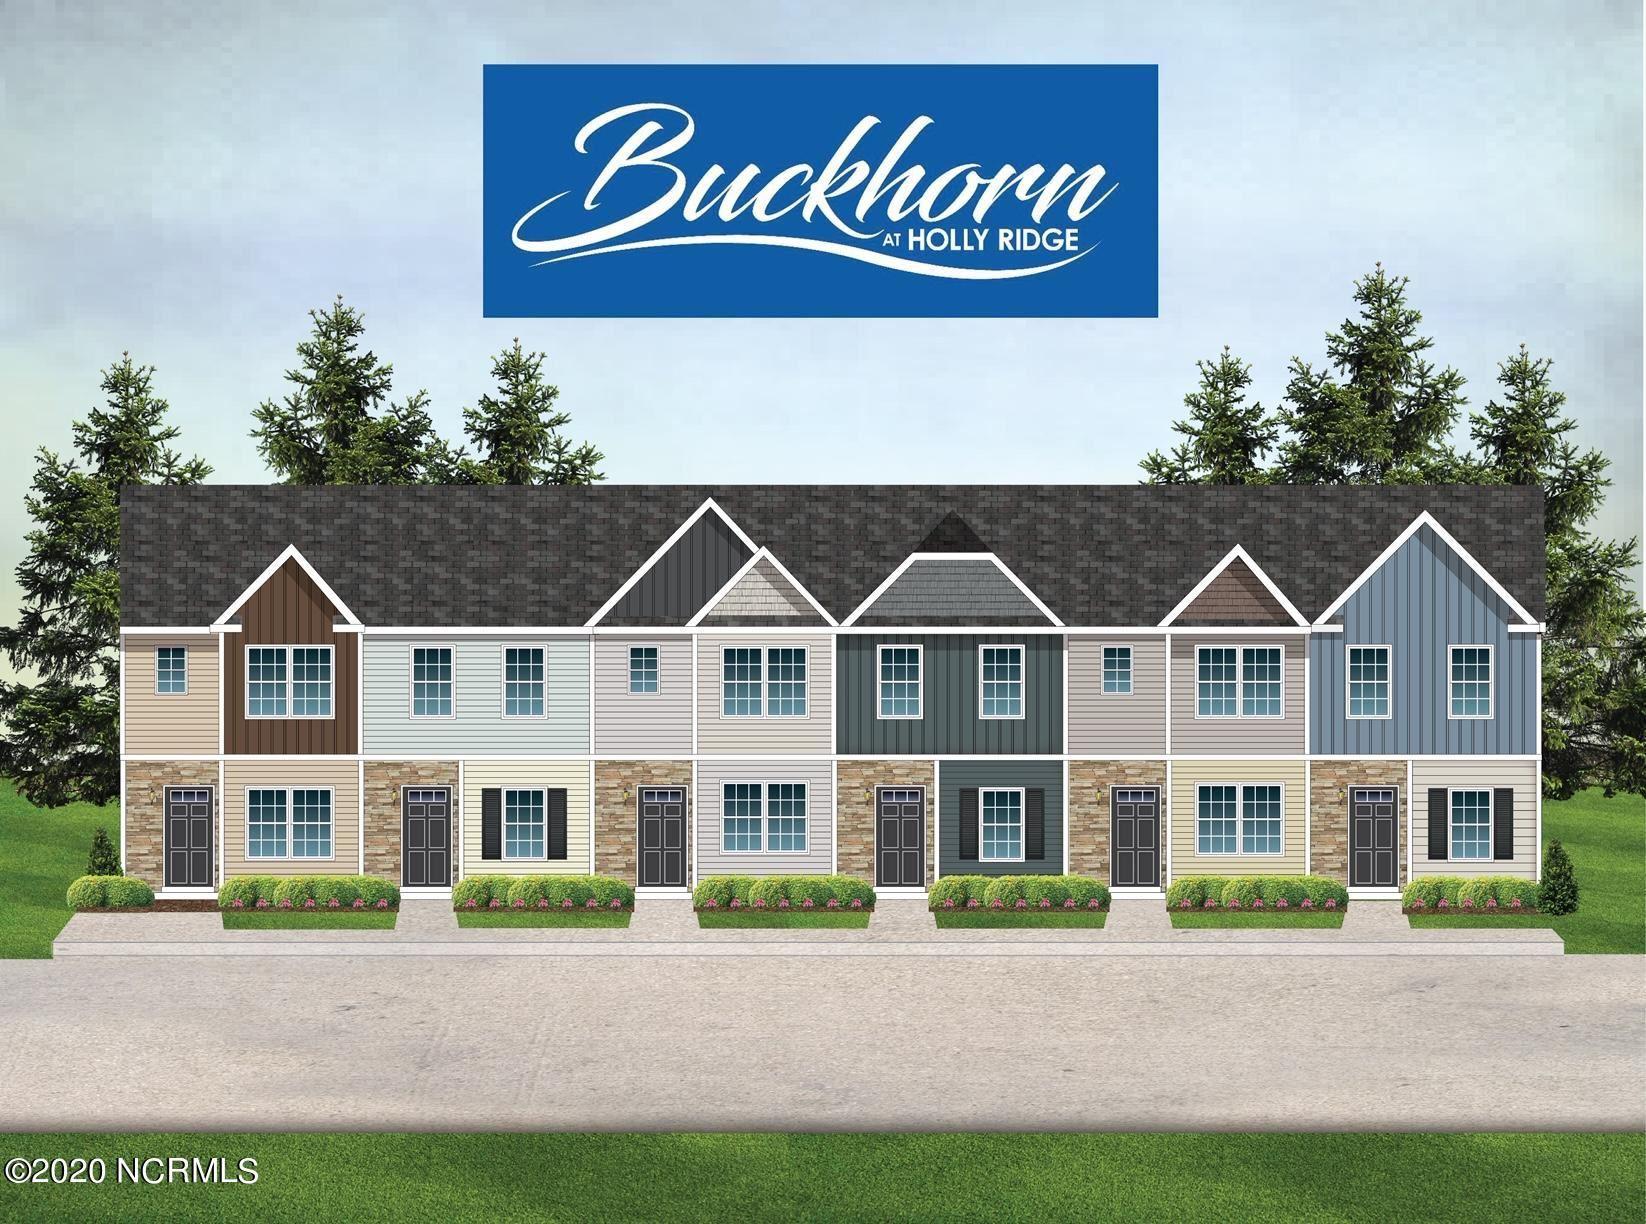 Photo of 159 Buckhorn Avenue, Holly Ridge, NC 28445 (MLS # 100250181)